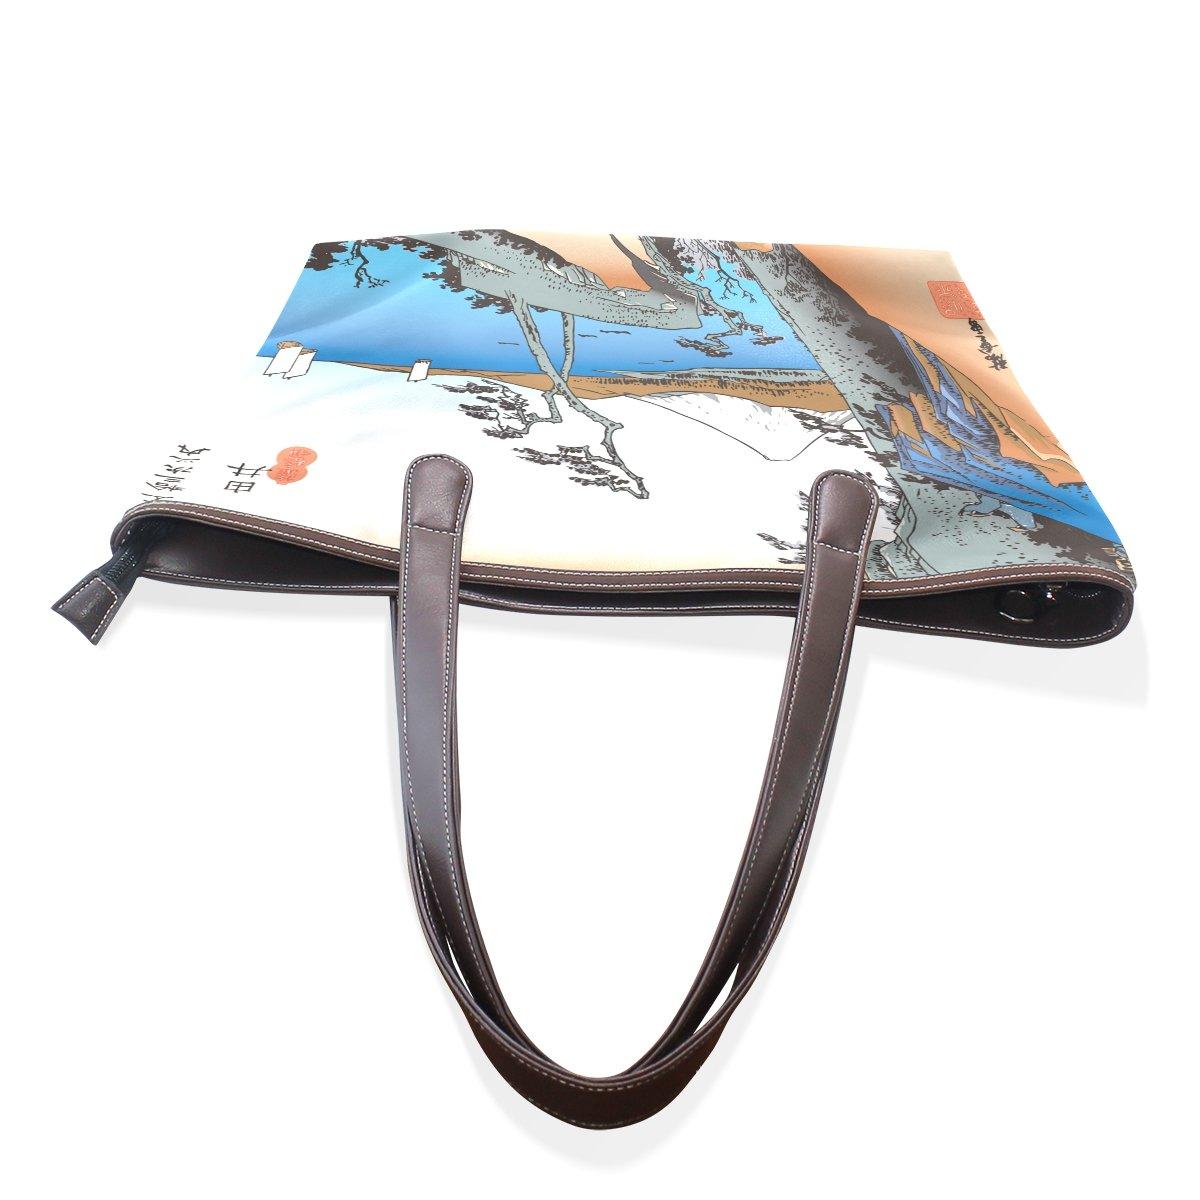 Ukiyoe Ukiyo-E Print Japanese Art Womens Fashion Large Shoulder Bag Handbag Tote Purse for Lady